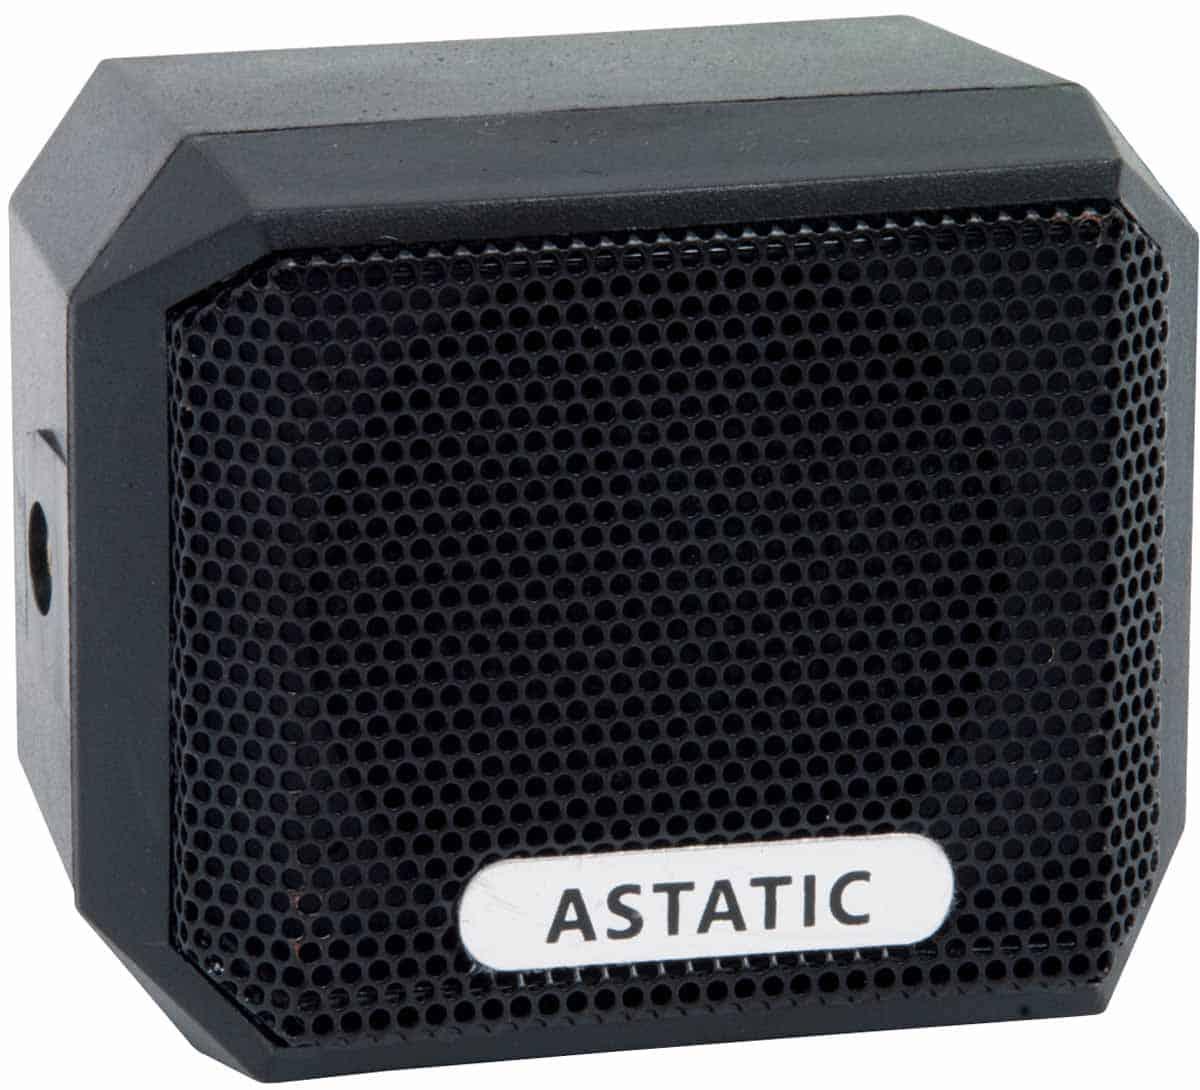 VS4 - Astatic 5 Watts 8 Ohms External Speaker with 10' Cord